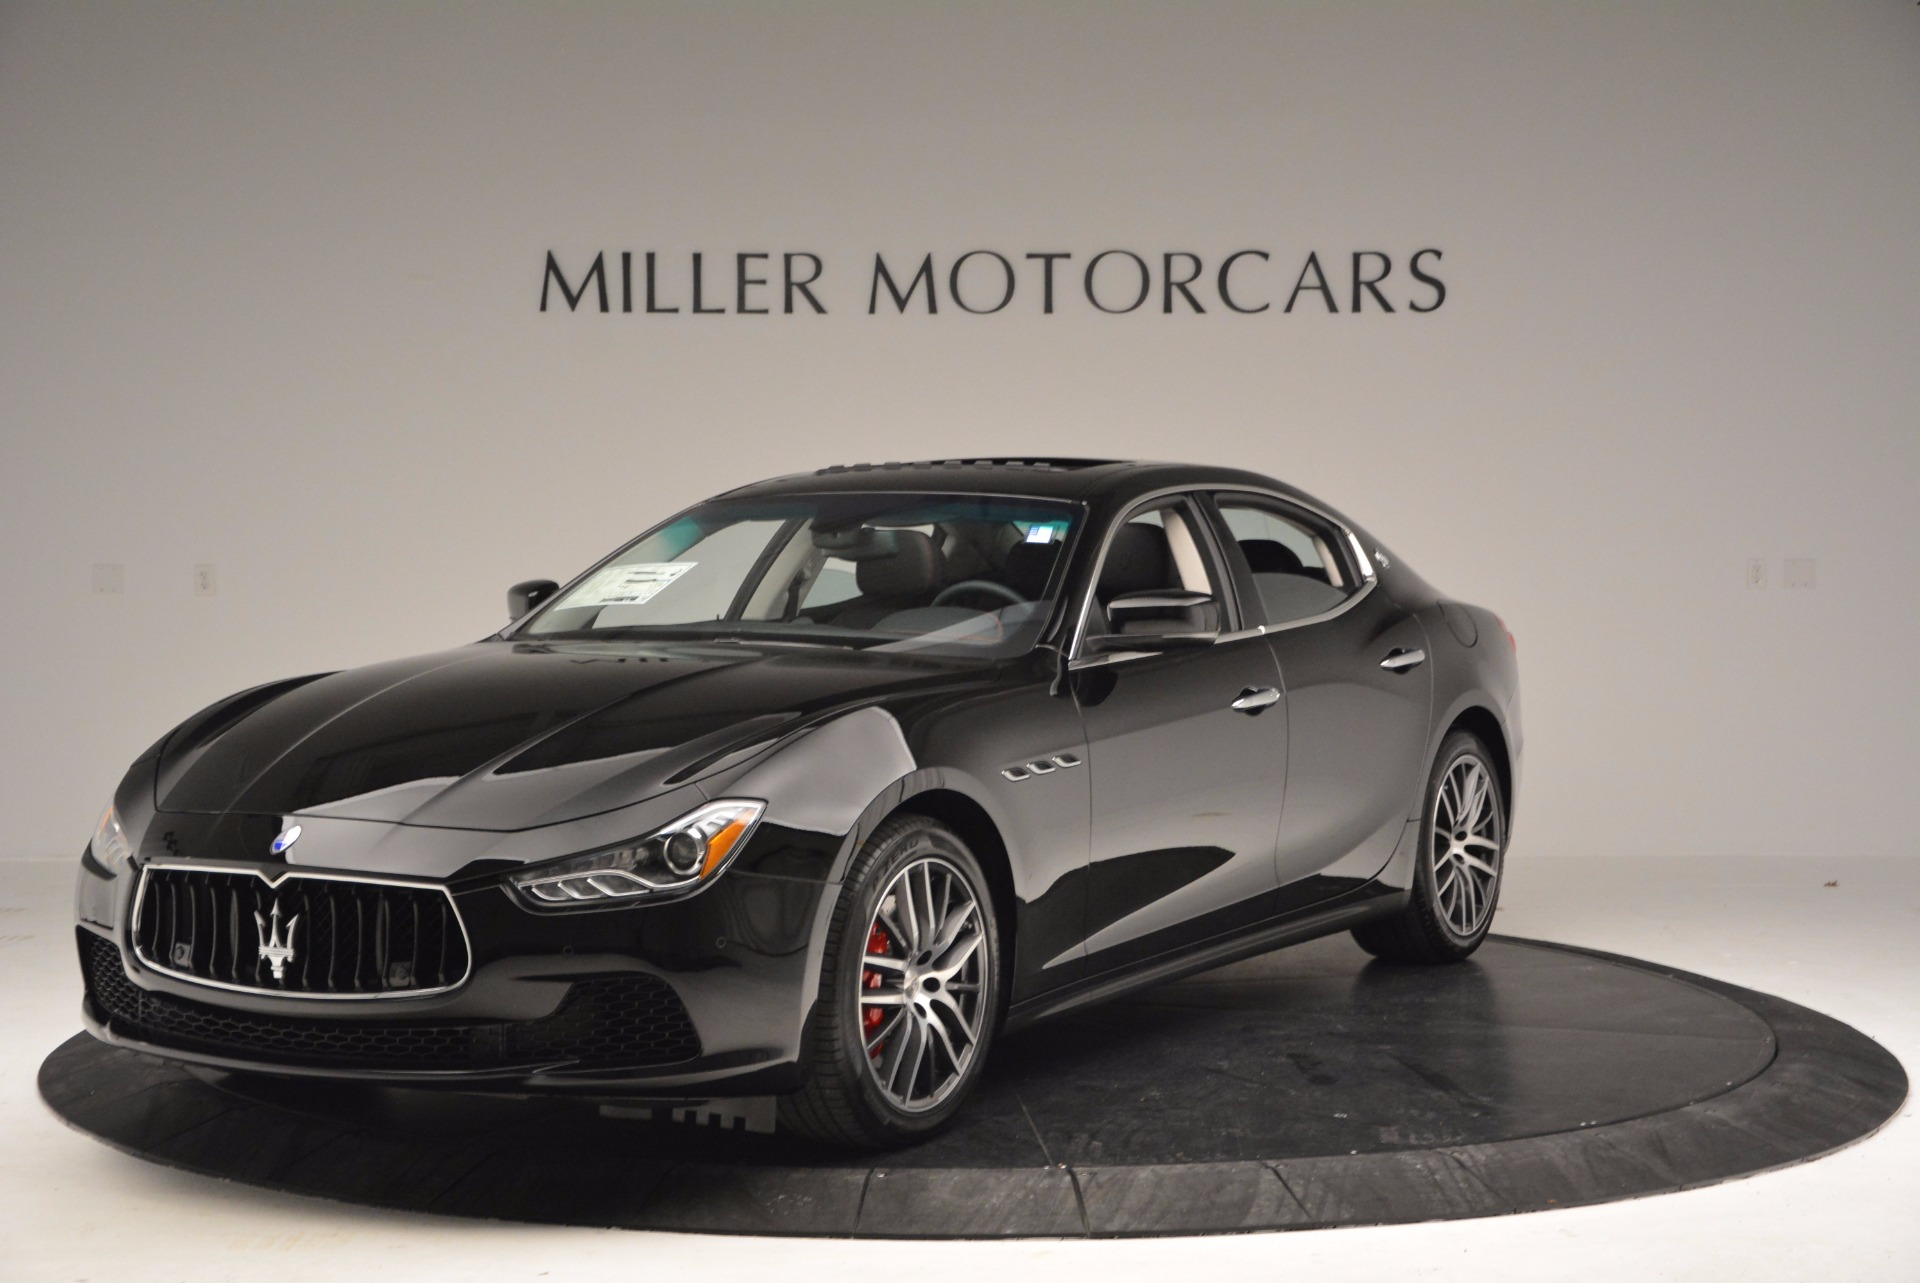 New 2017 Maserati Ghibli S Q4 For Sale In Greenwich, CT 1029_main